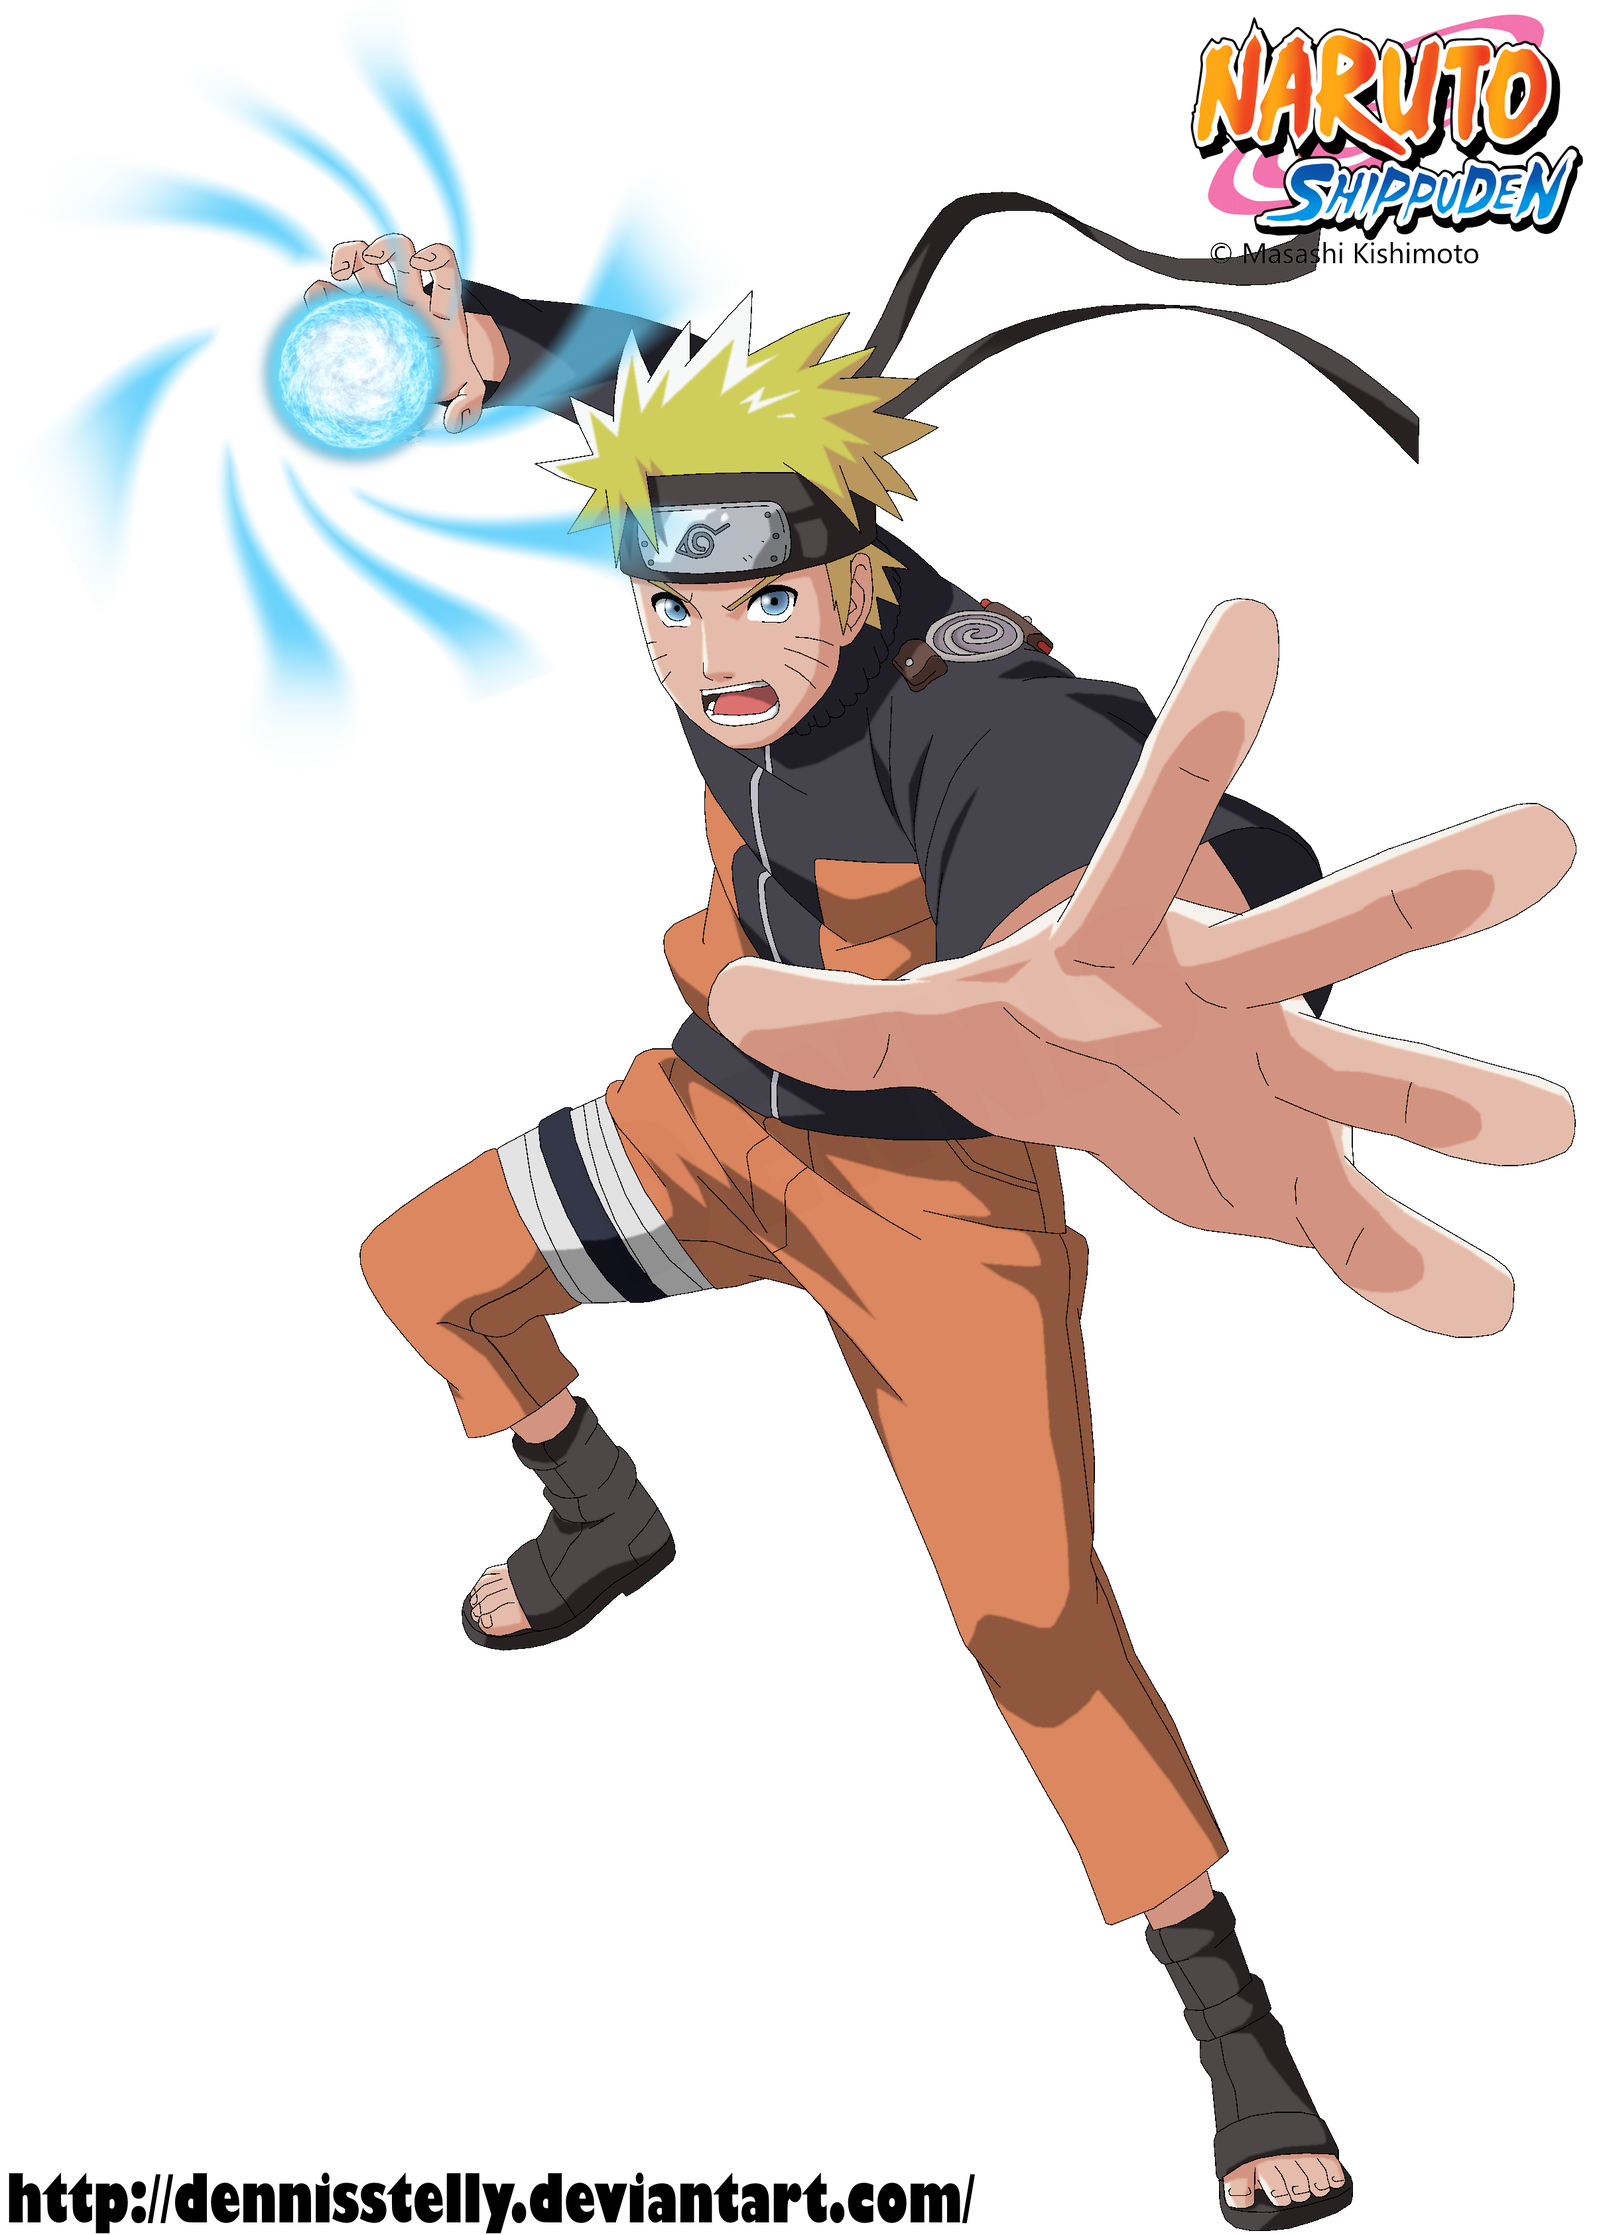 Naruto Rasengan By Dennisstelly On Deviantart Naruto Uzumaki Naruto Naruto Uzumaki Shippuden